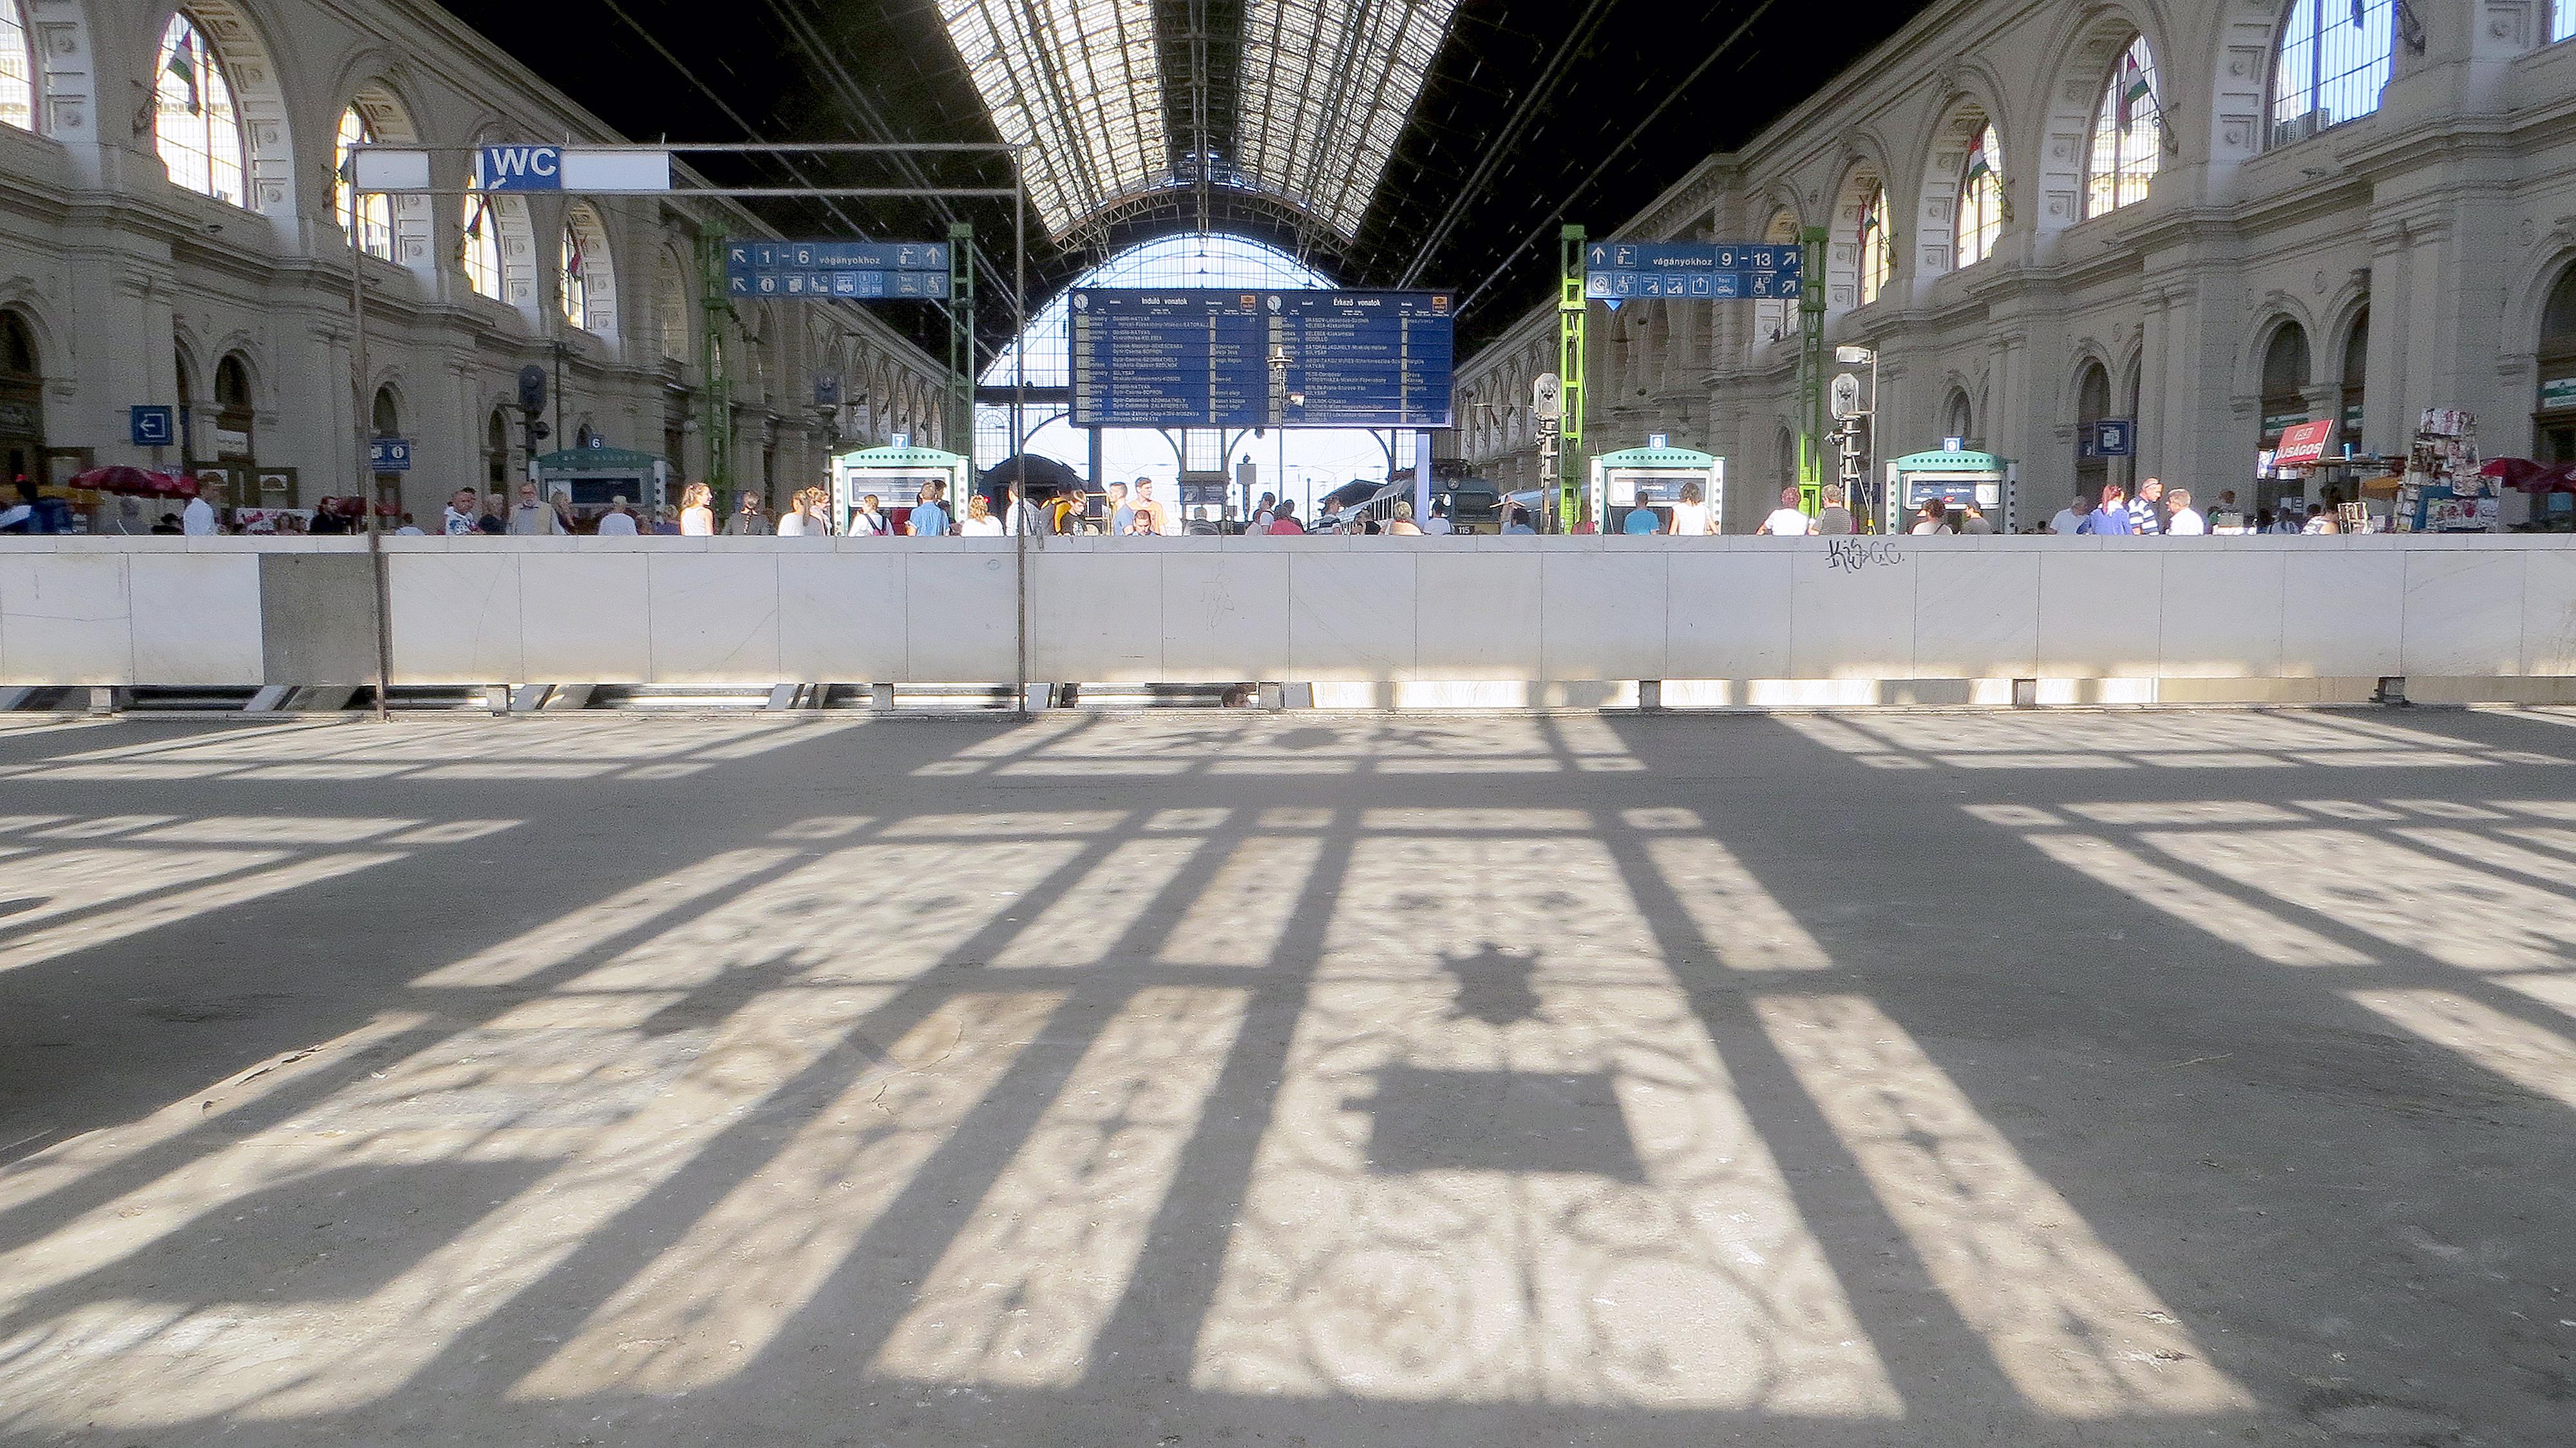 Trainstationspotting - Keleti Palyaudvar train station, Budapest, Hungary, 2013